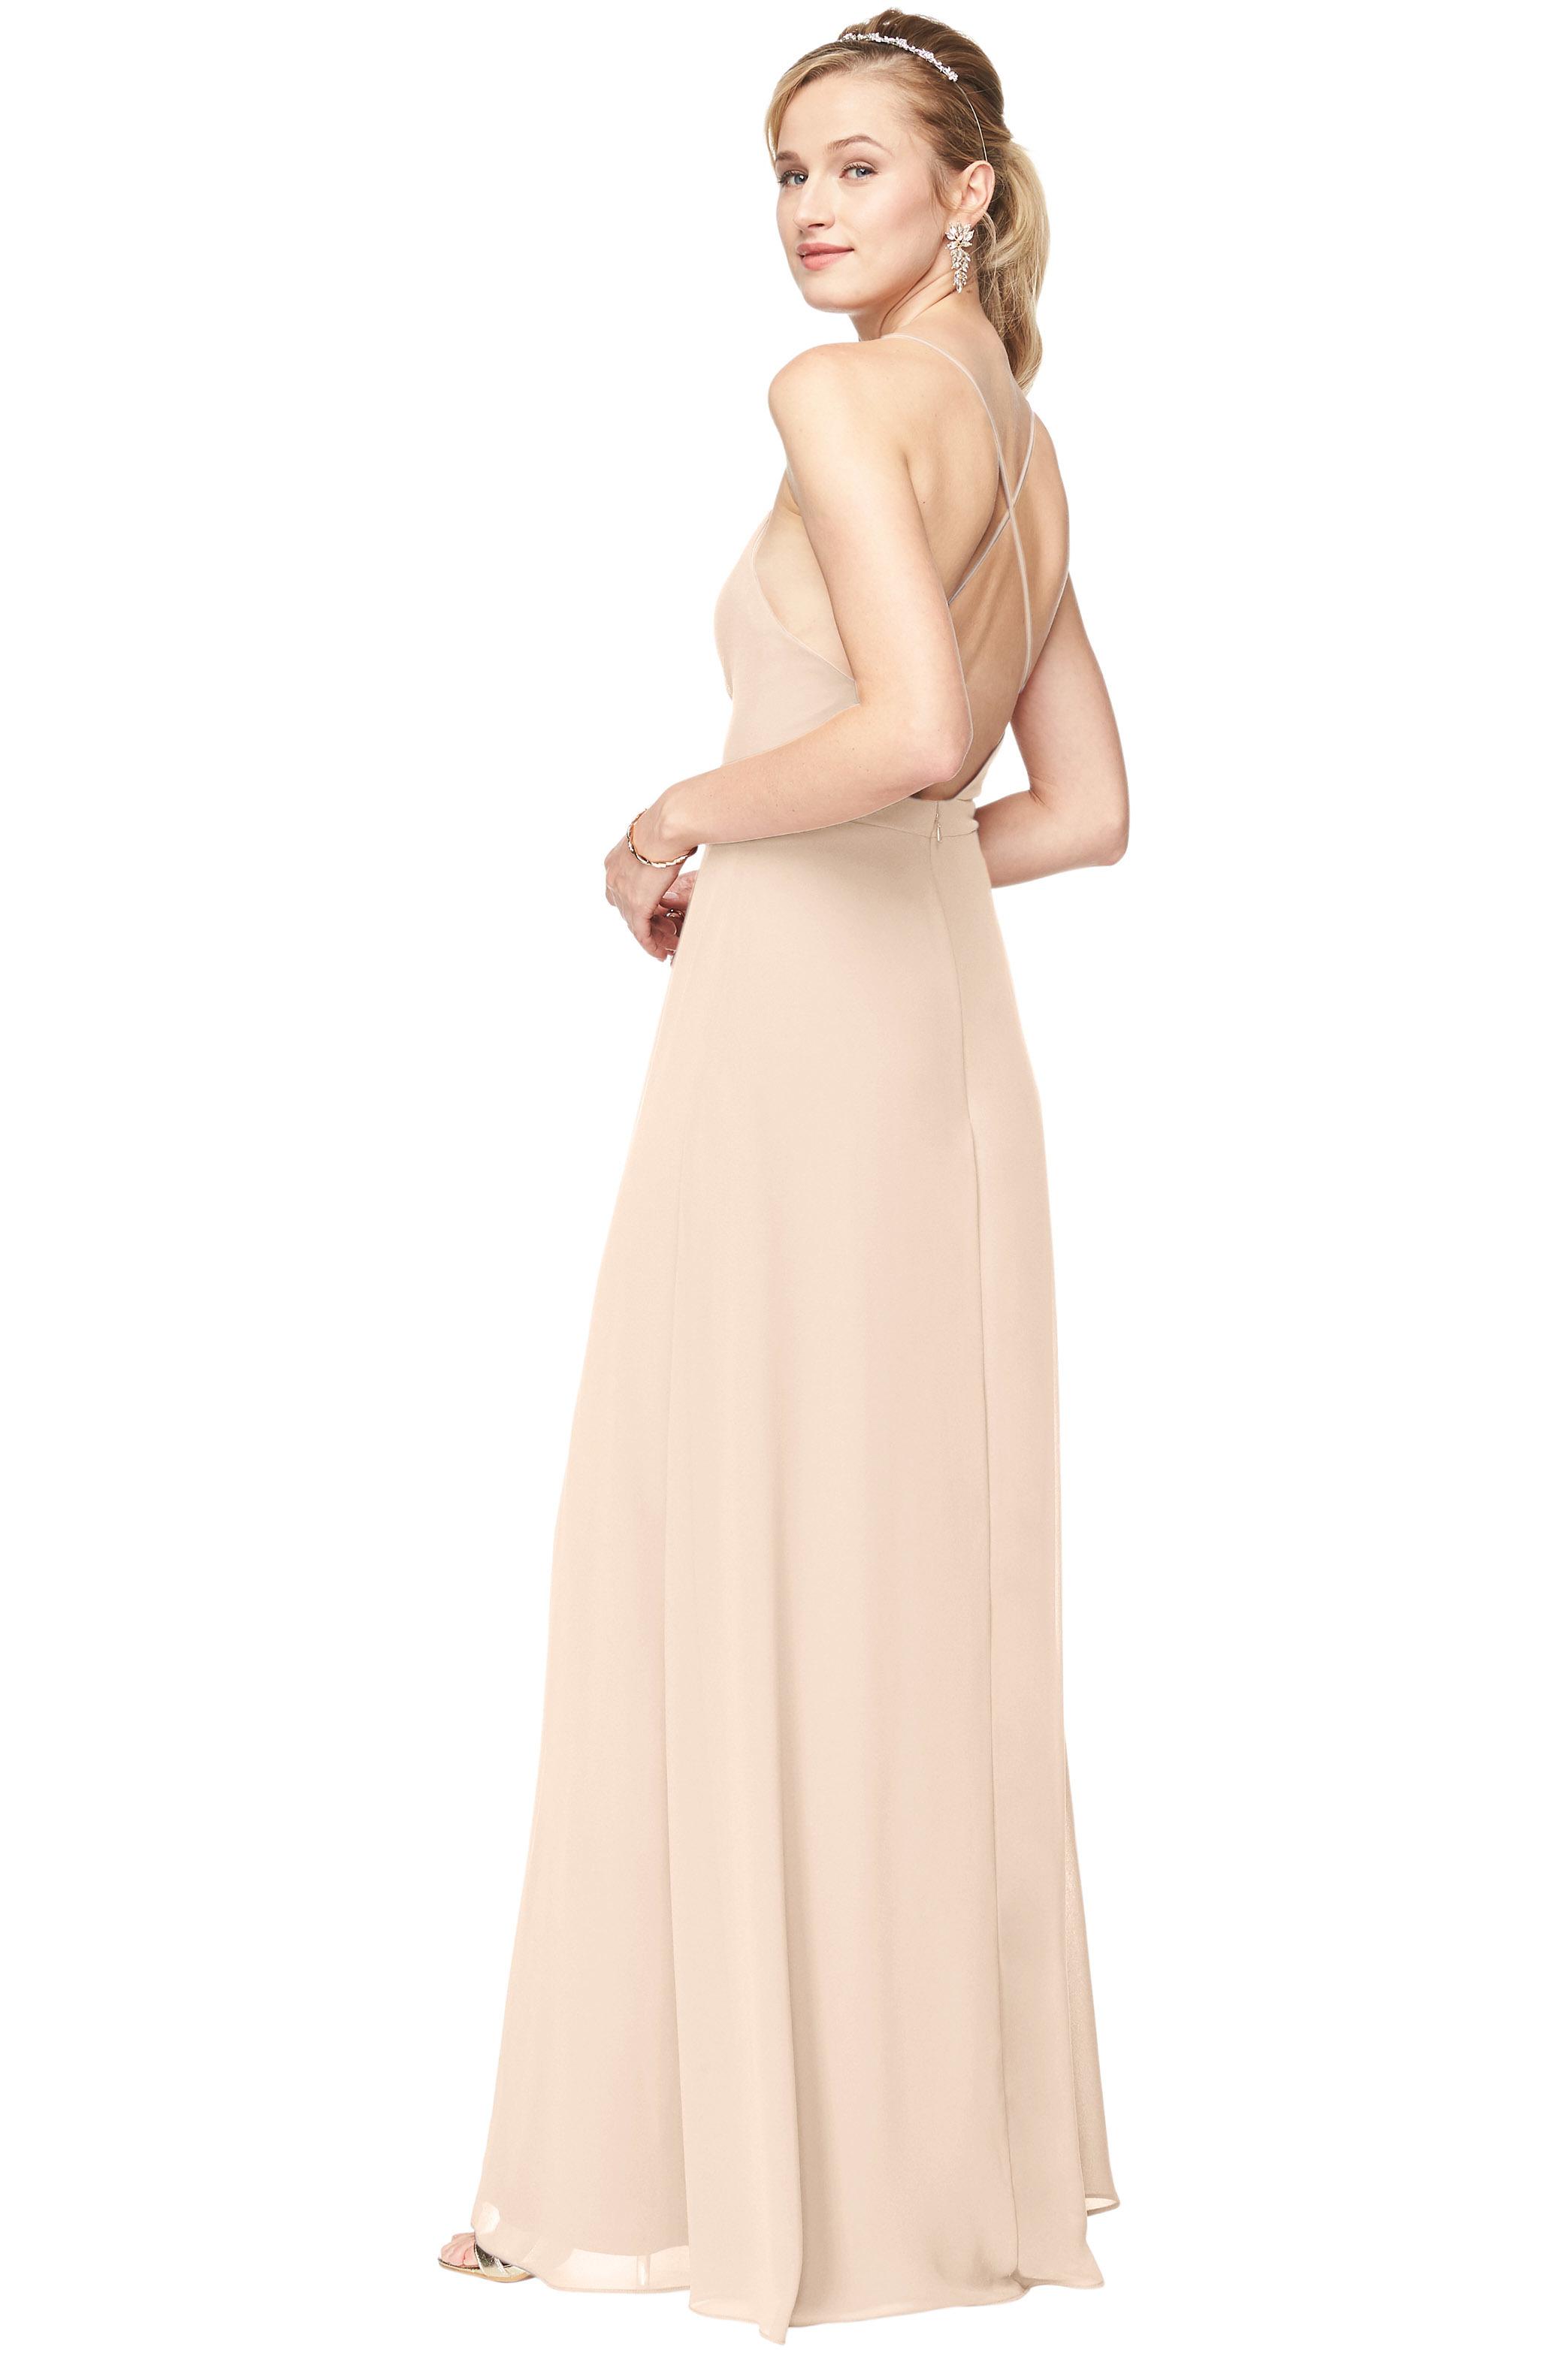 Bill Levkoff CHAMPAGNE Chiffon Surplice A-Line gown, $178.00 Back